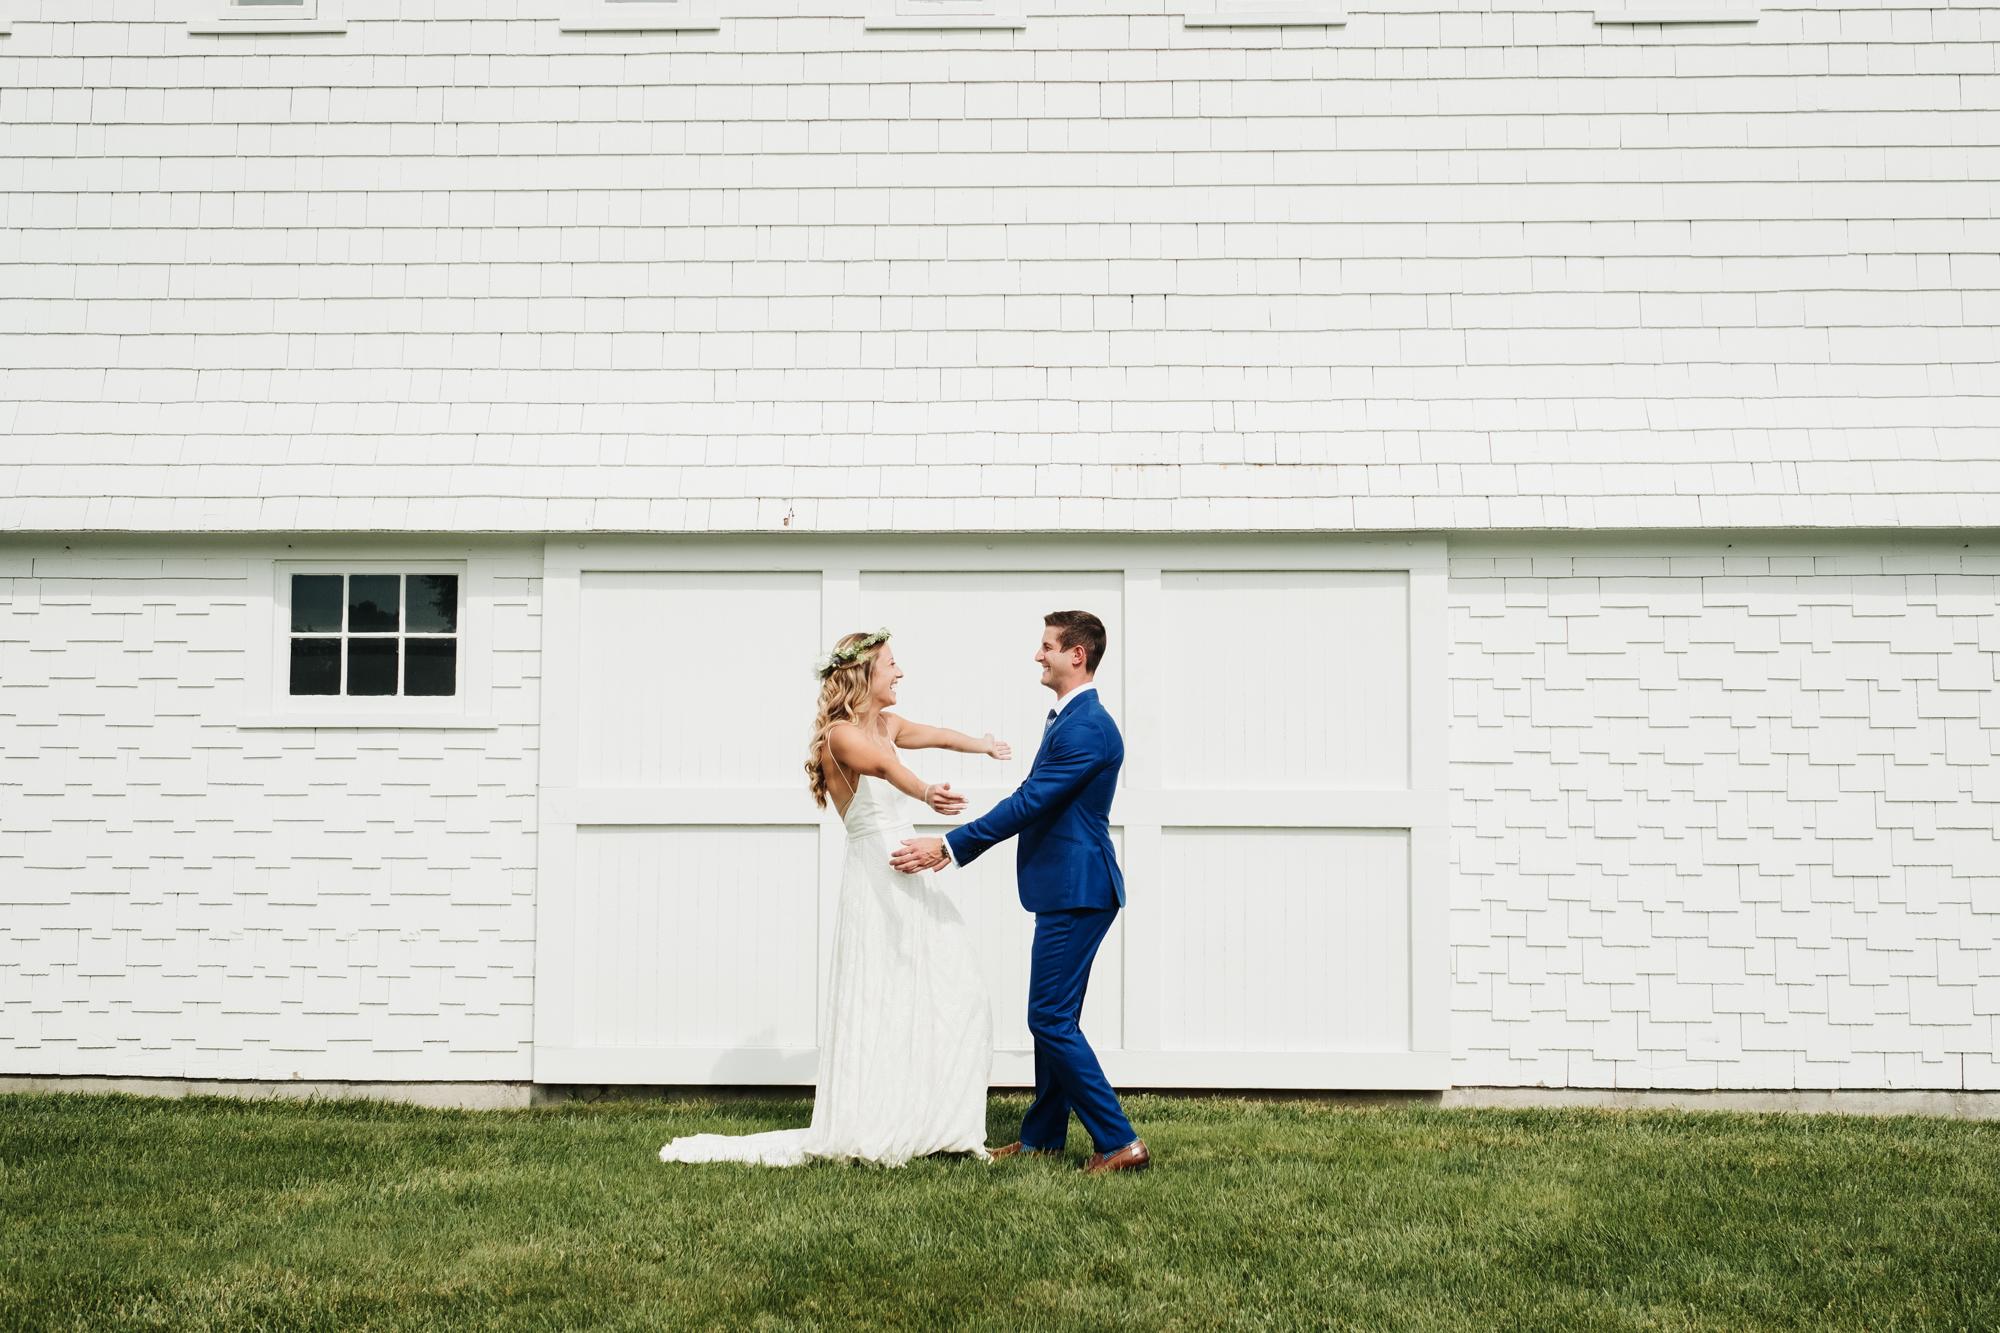 Wedding_Francis_Boucher_Jonathan_Edwards_Winery_2018-24.jpg